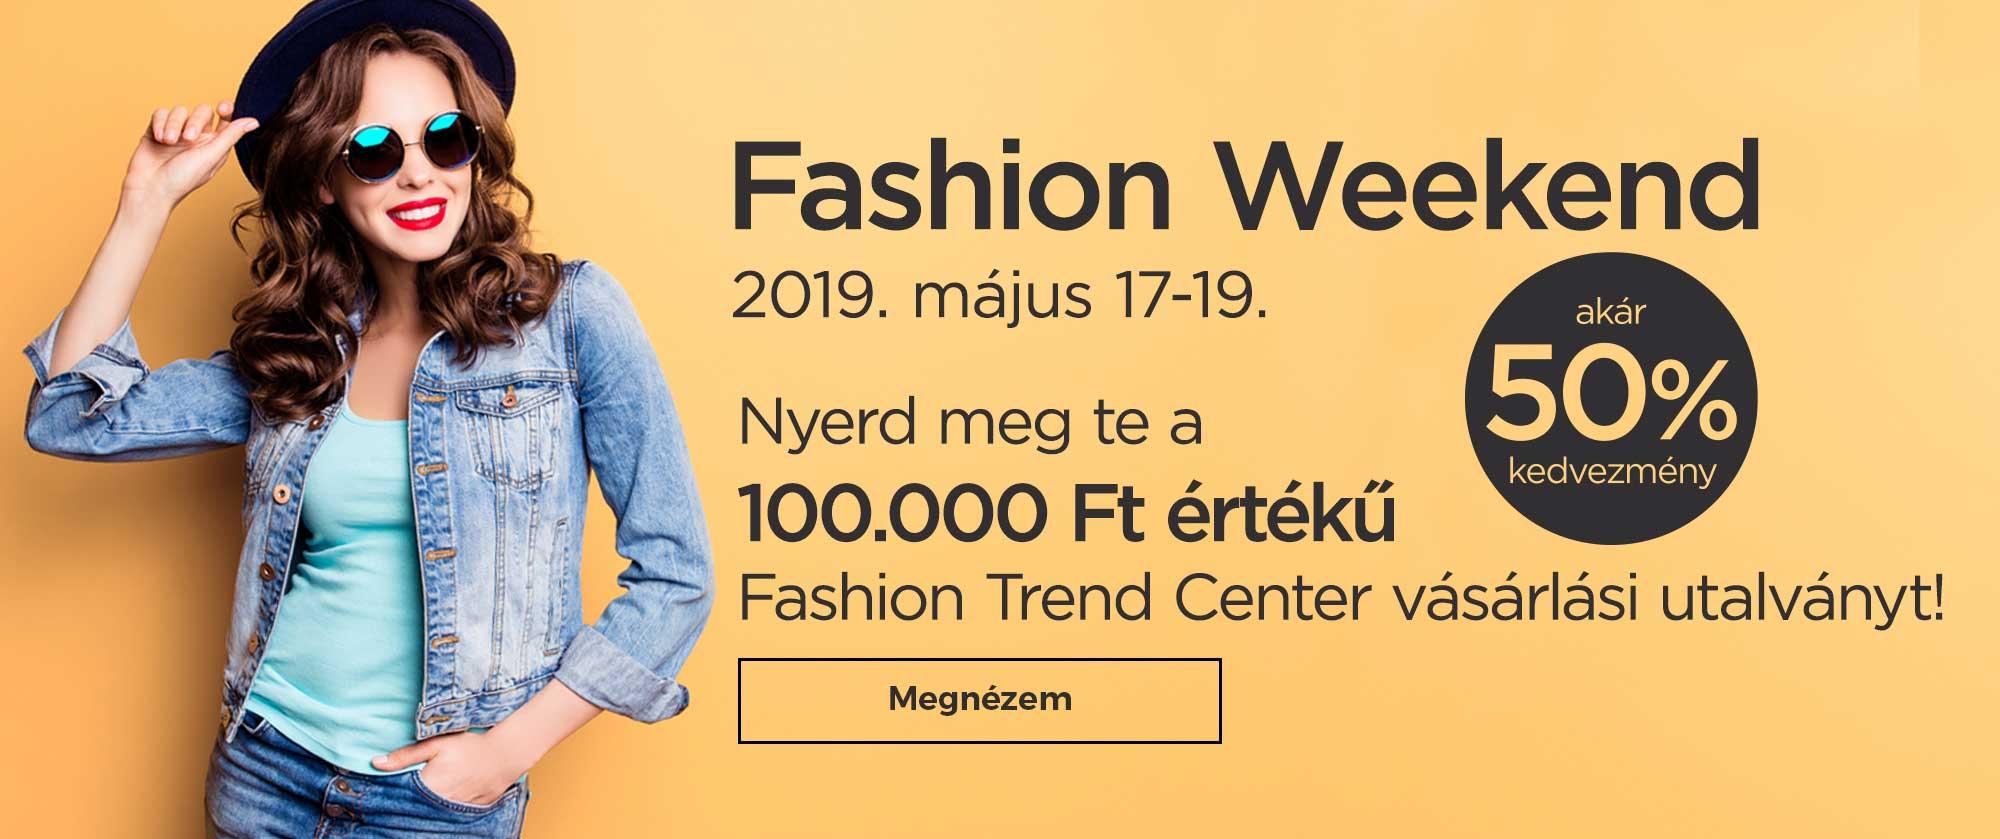 4bcdc4a442 Fashion Weekend - Fashiontrendcenter